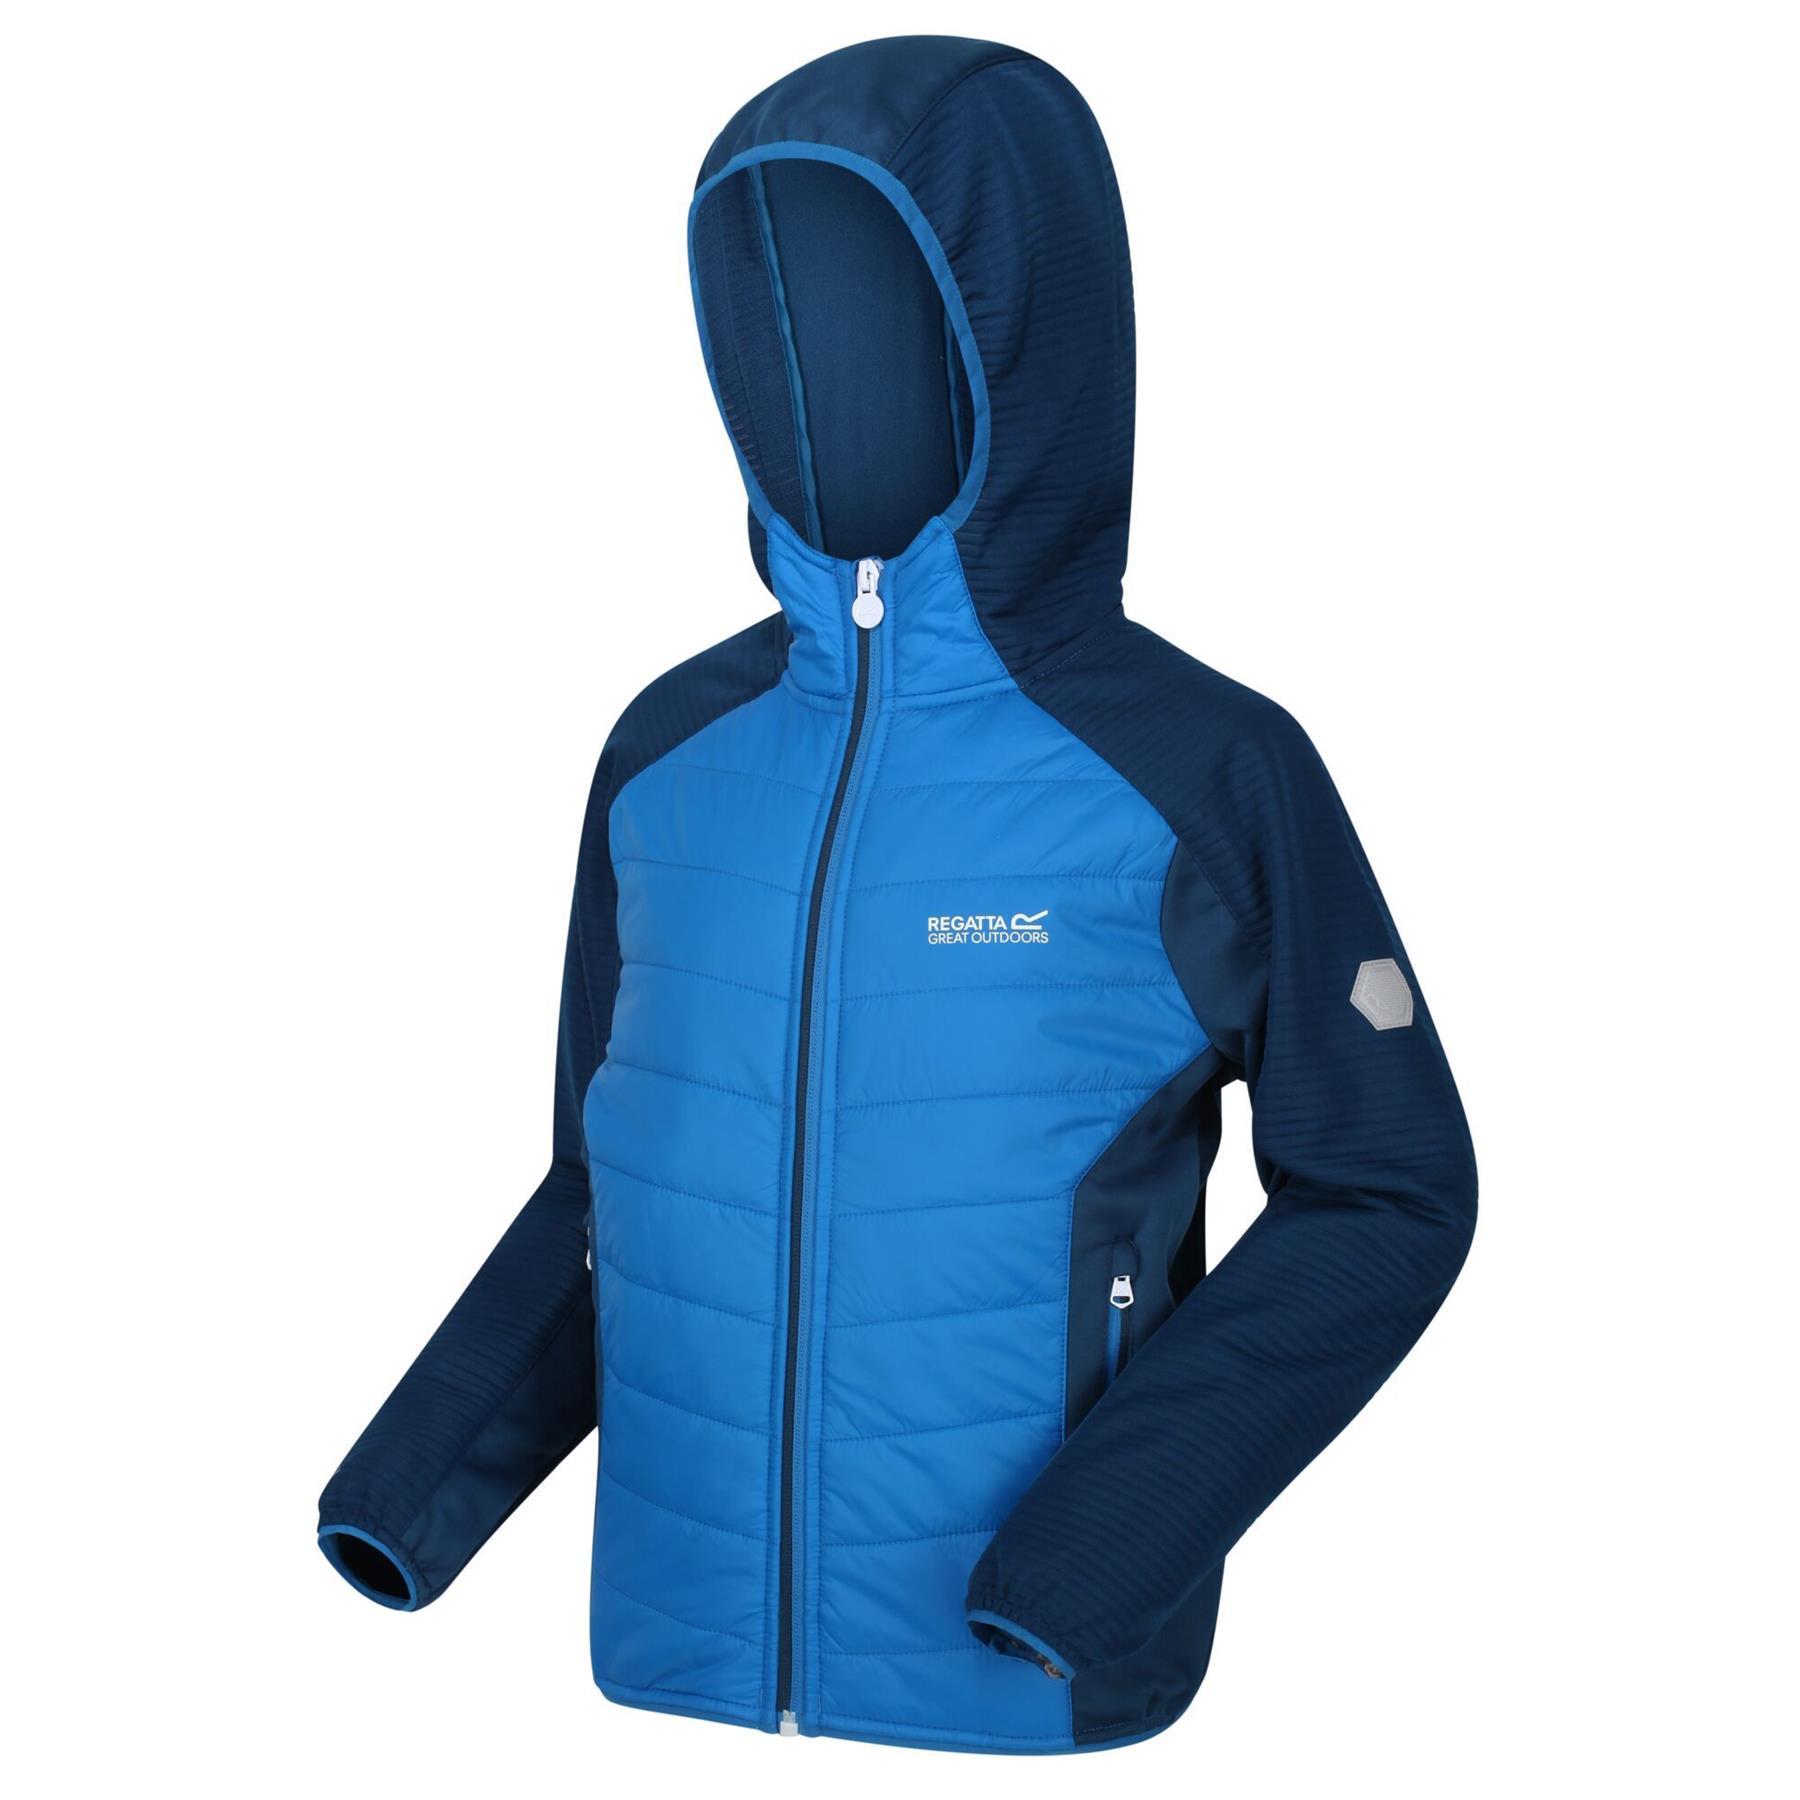 miniatuur 5 - Regatta Kids Kielder IV Lightweight Hybrid Softshell Jacket Boys Girls Coat